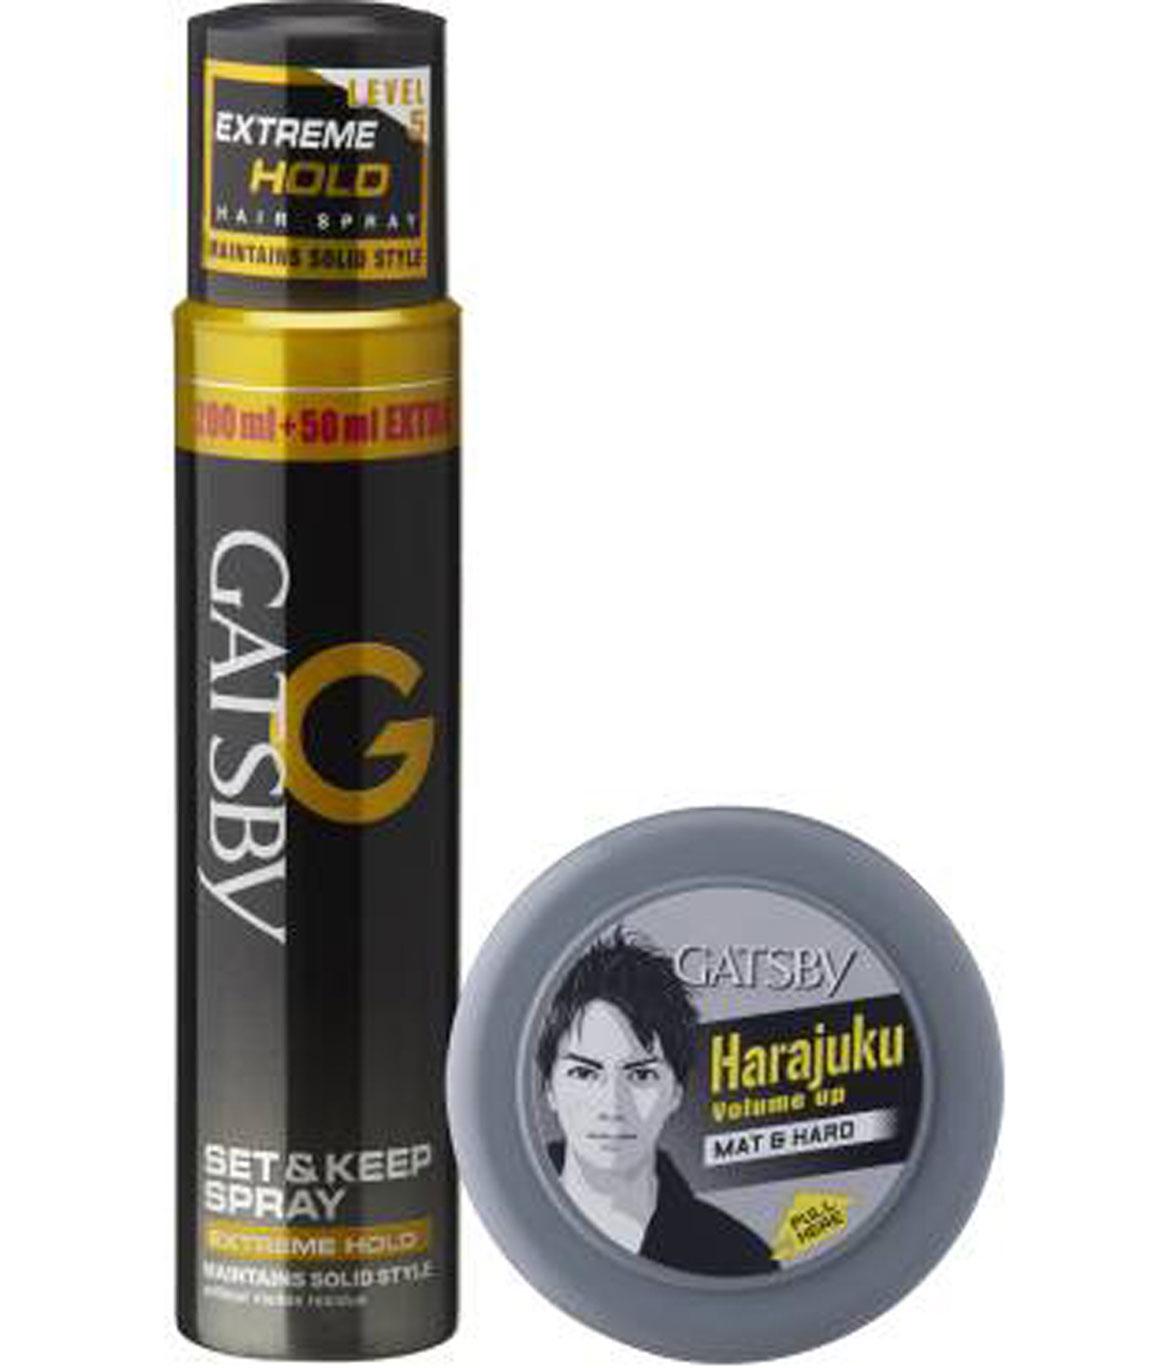 GATSBY SET & KEEP HAIR SPRAY EXTREME HOLD 250 ML WITH HAIR STYLING WAX MAT & HARD 75 Gm SPRAY (325 G)